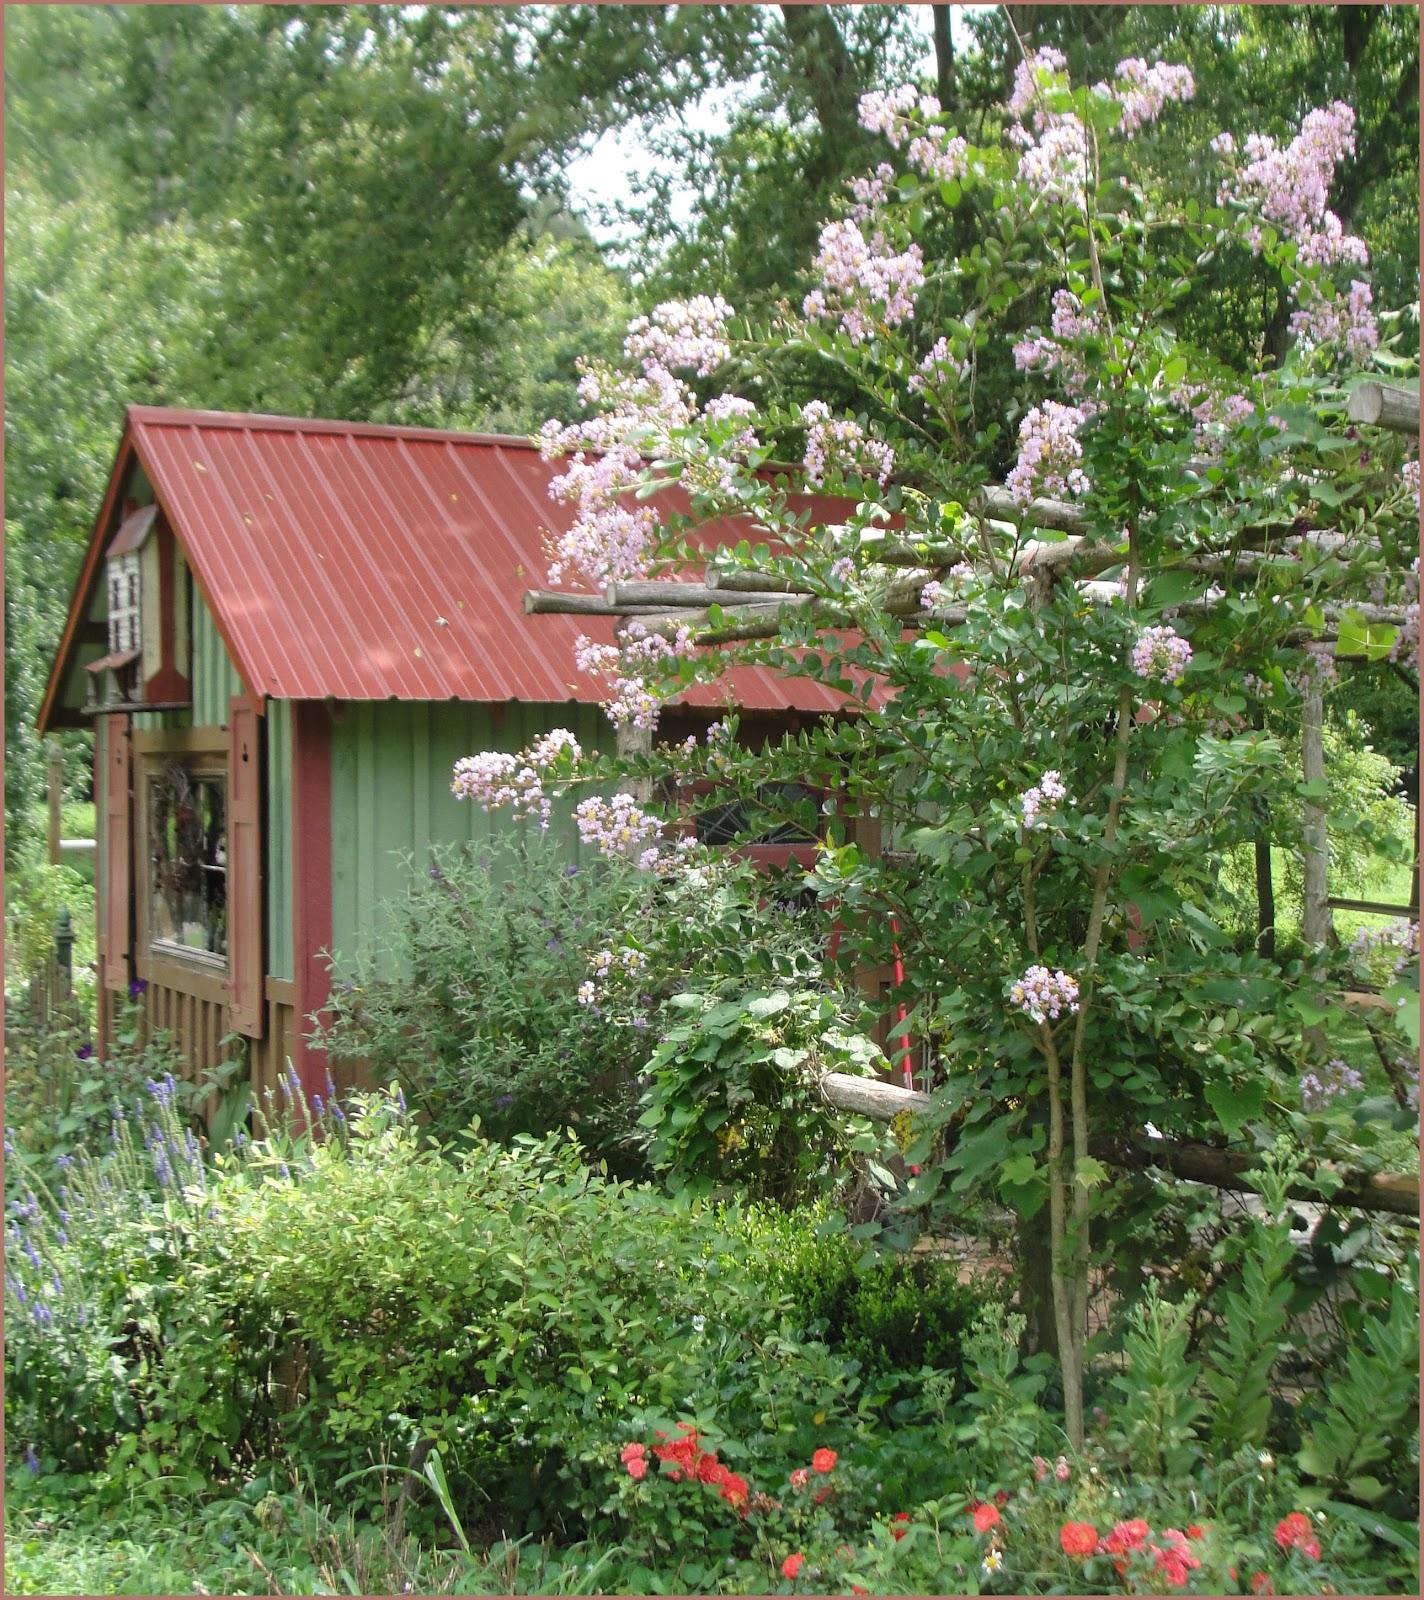 Hopalong hollow gazette potting shed and garden wrap up for Potting shed